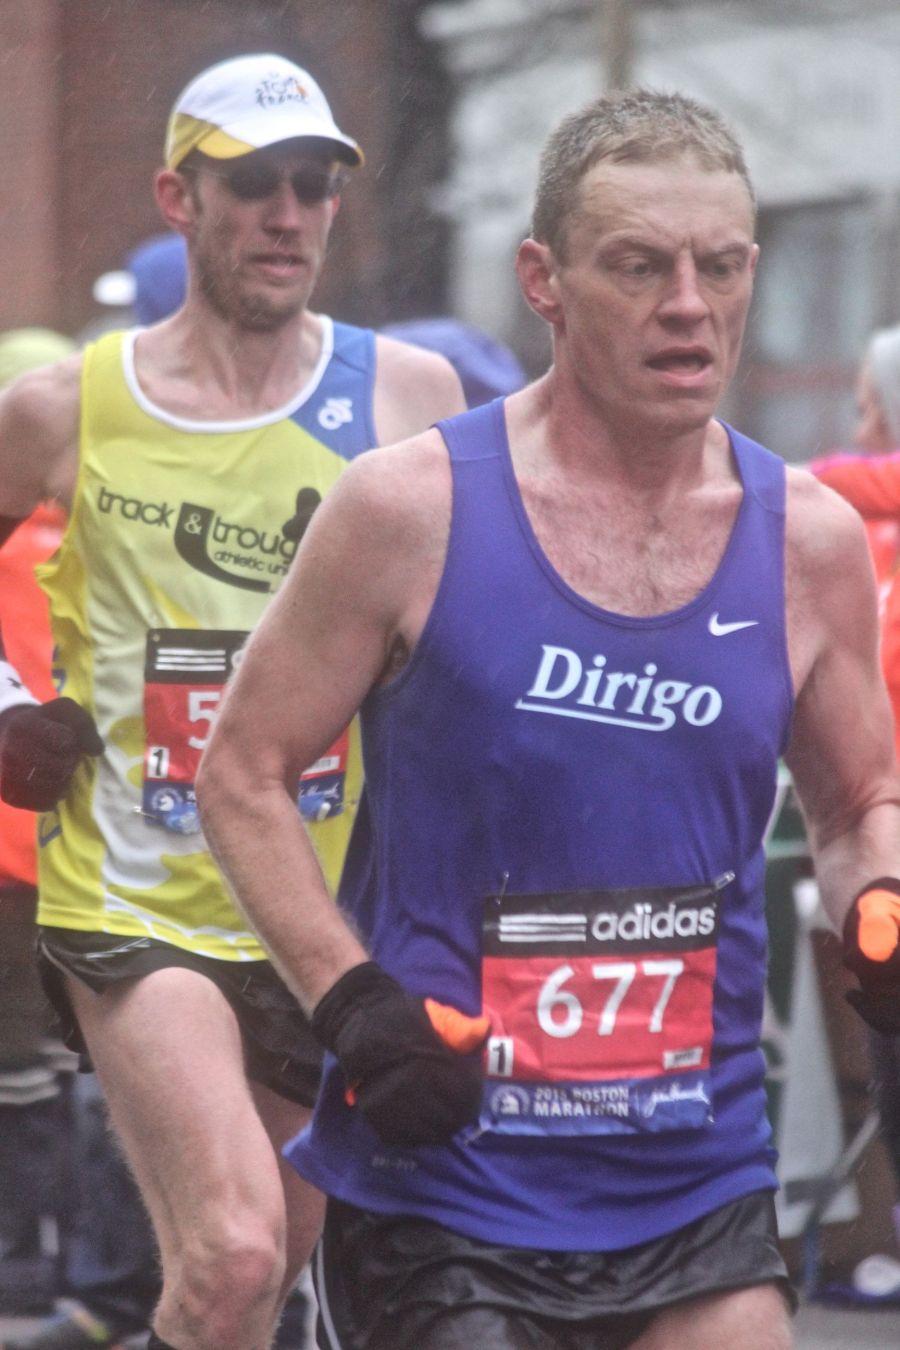 boston marathon april 20 2015 racer number 677